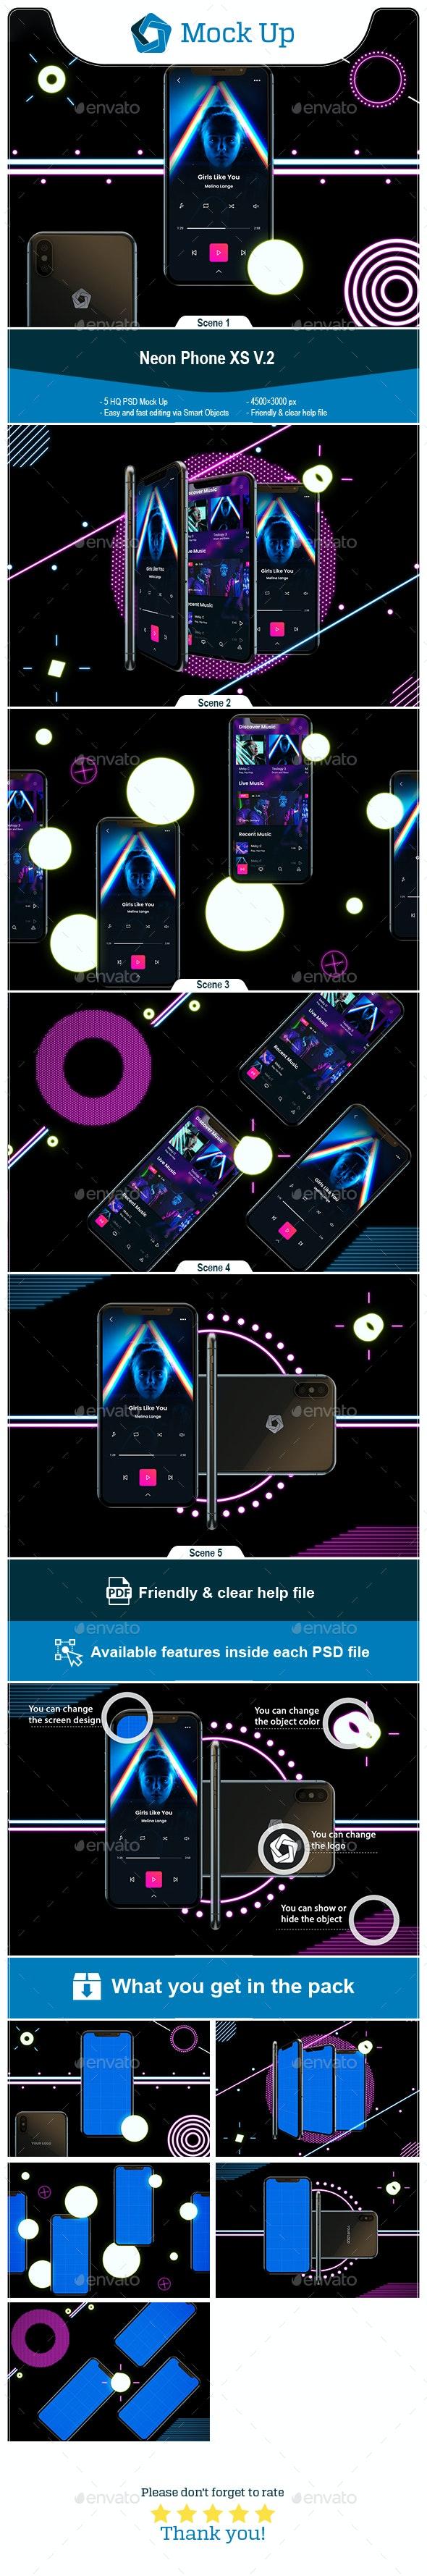 Neon Phone XS V.2 Mockup - Mobile Displays